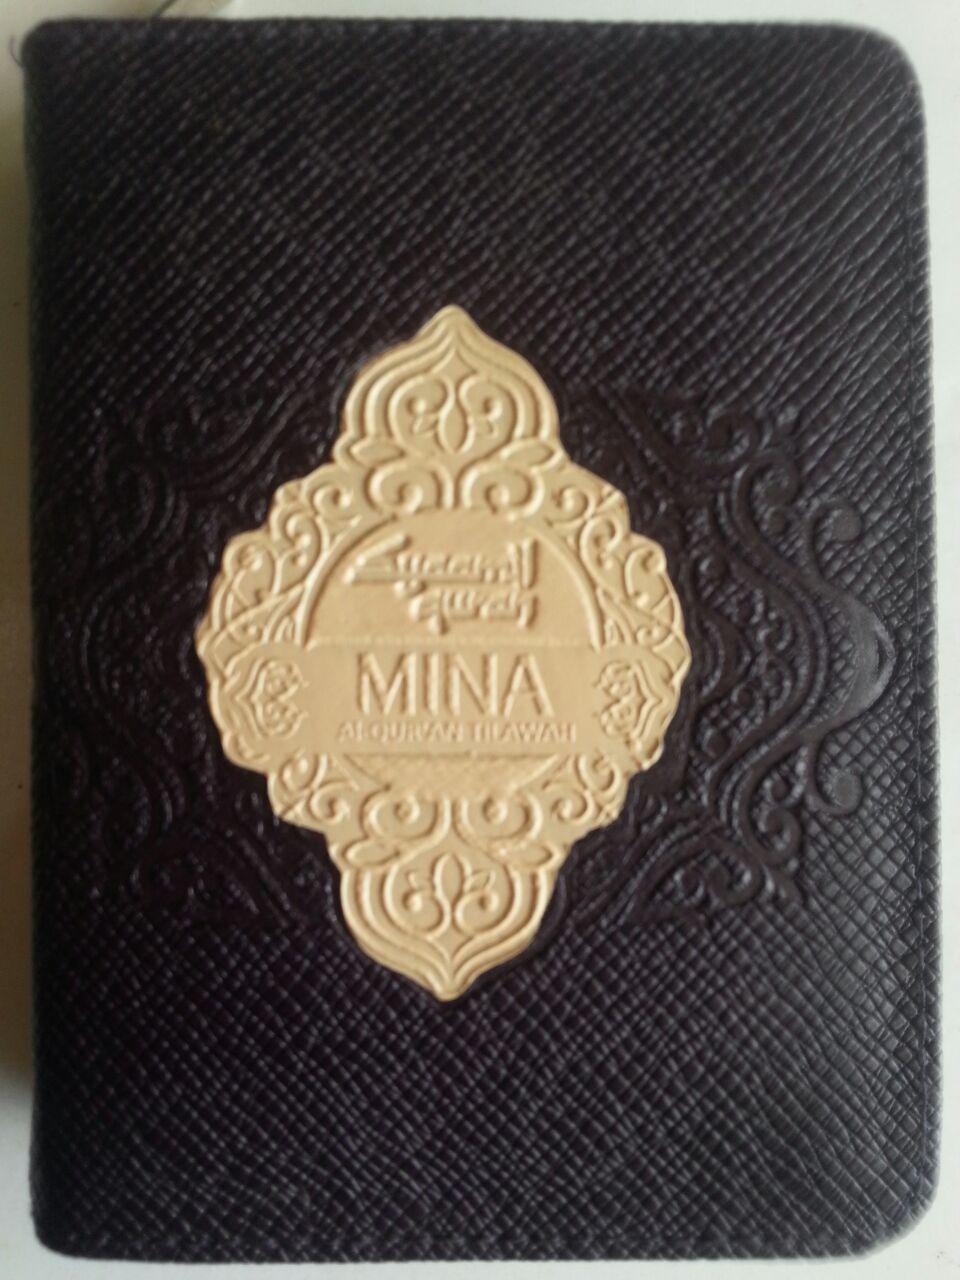 Al-Qur'an Saku Tilawah Mina Tanpa Terjemah Resleting A7 cover 2